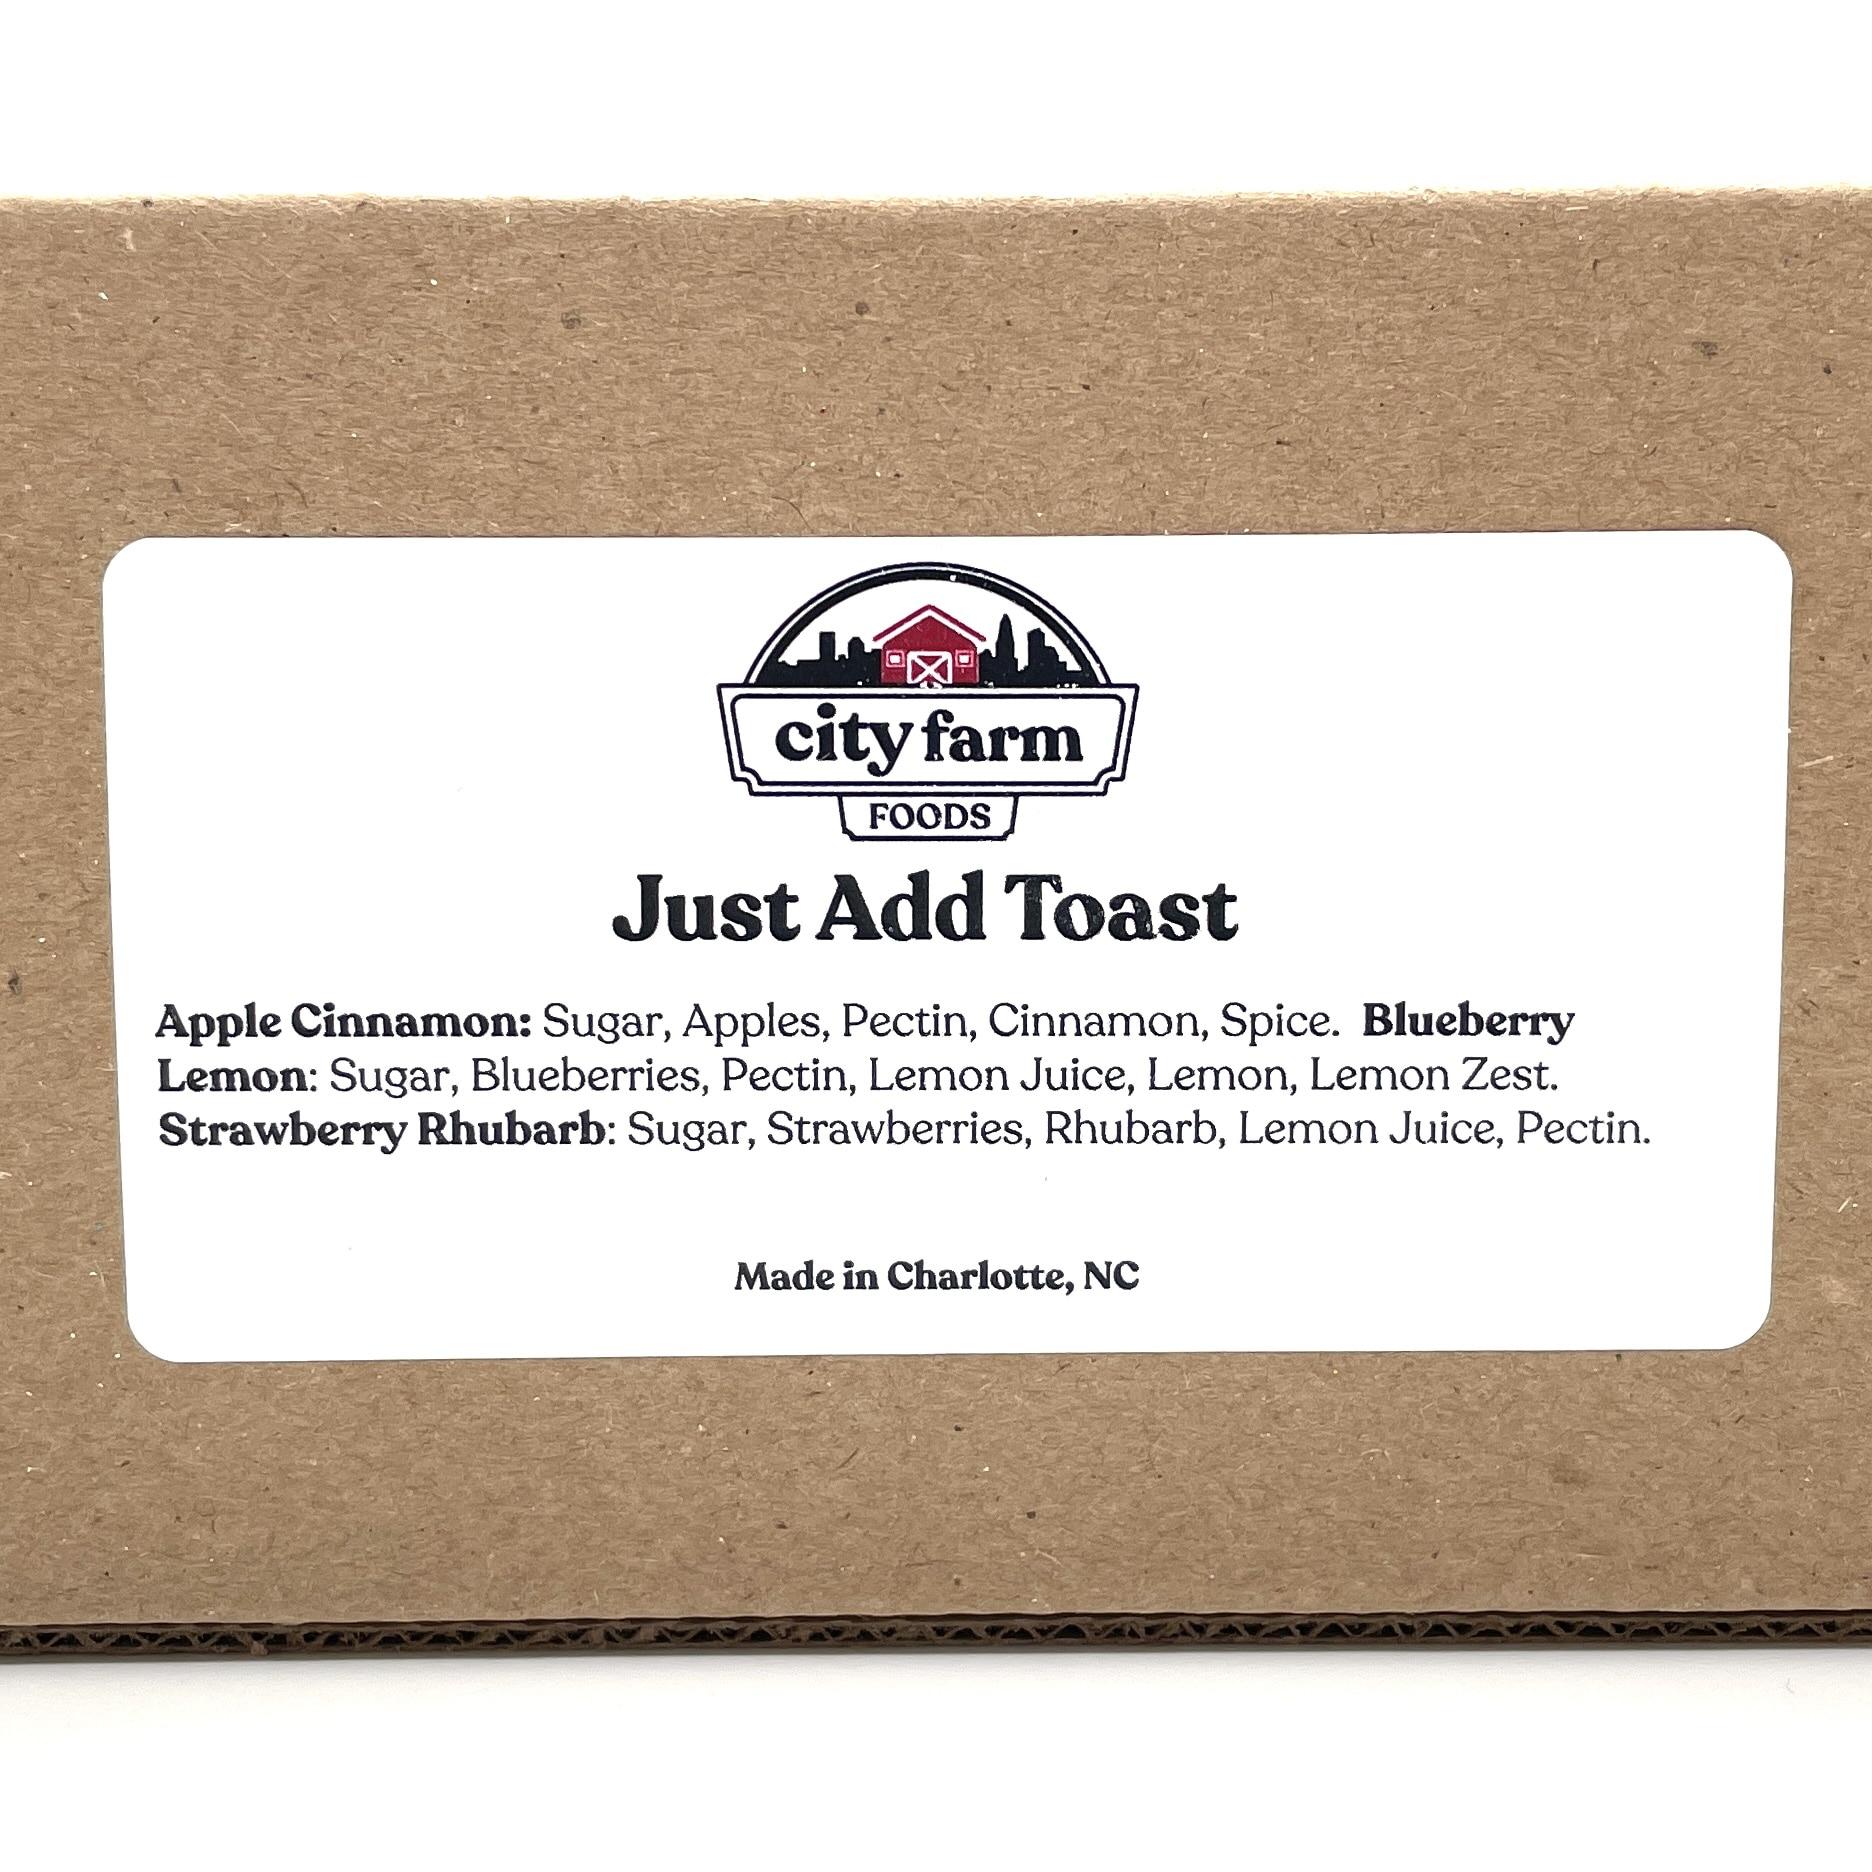 Just Add Toast Jam Set Label